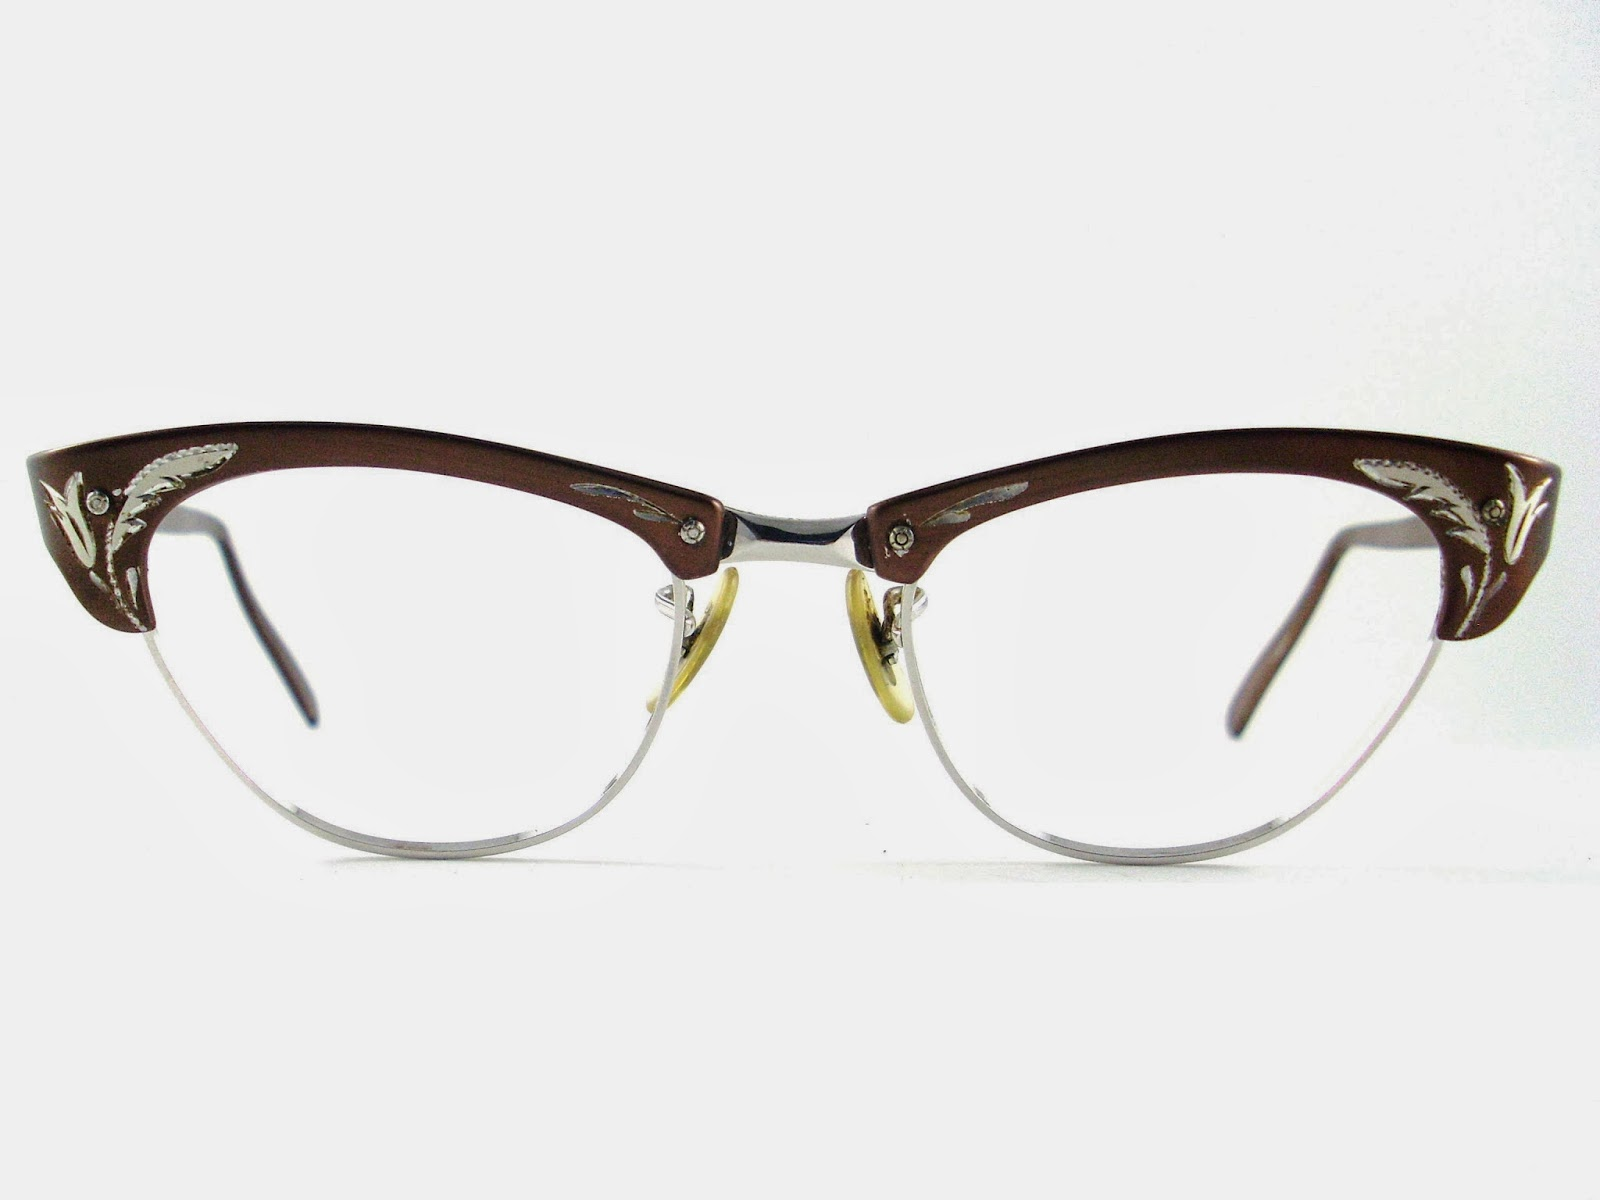 941e5e3564f Vintage Glasses Frames